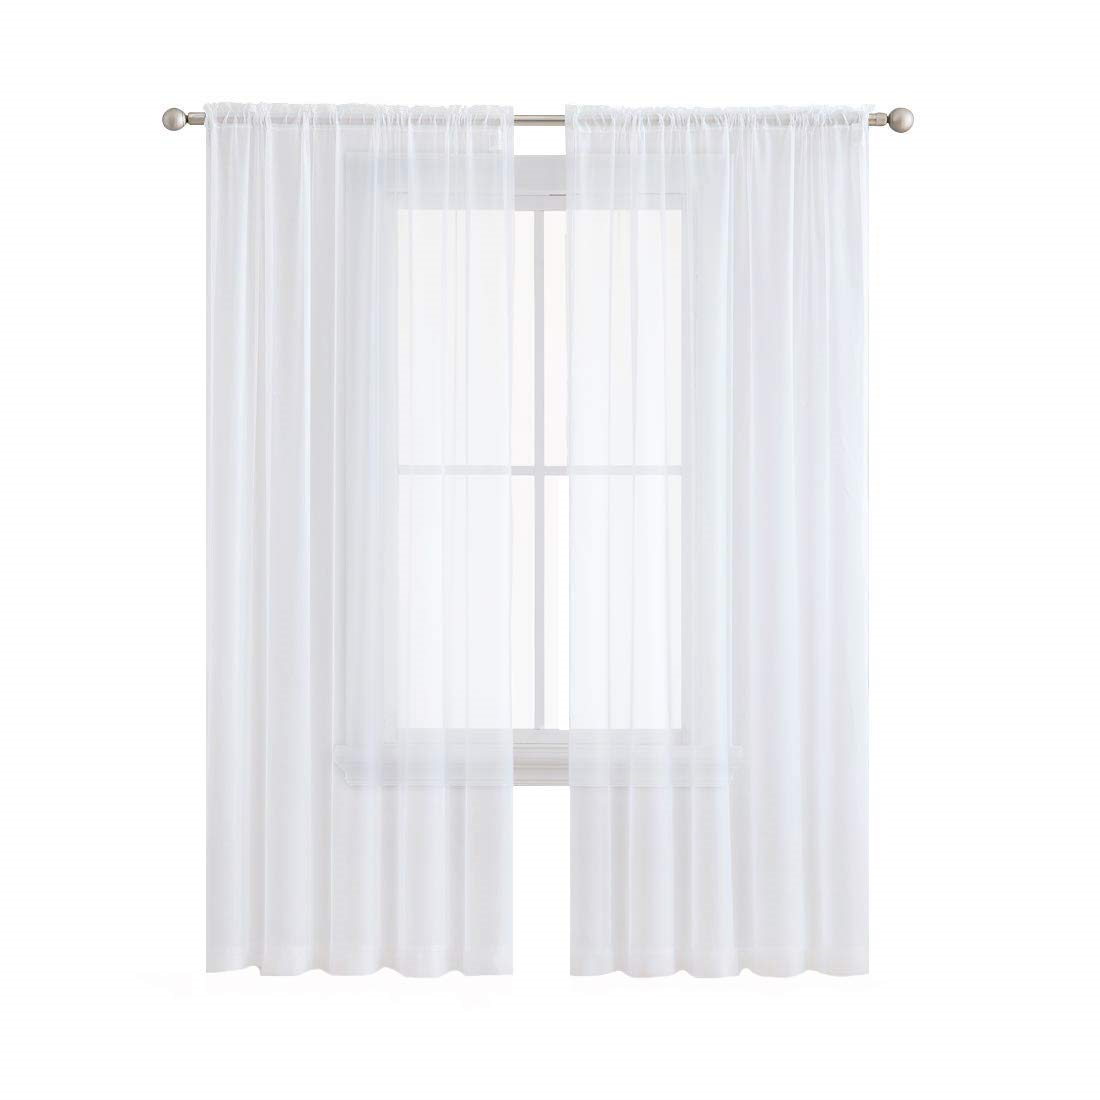 Black /& White Sheer Curtains Sheer Curtains Window Curtains. Sheer Curtains Black Sheer curtains White Sheer Curtains